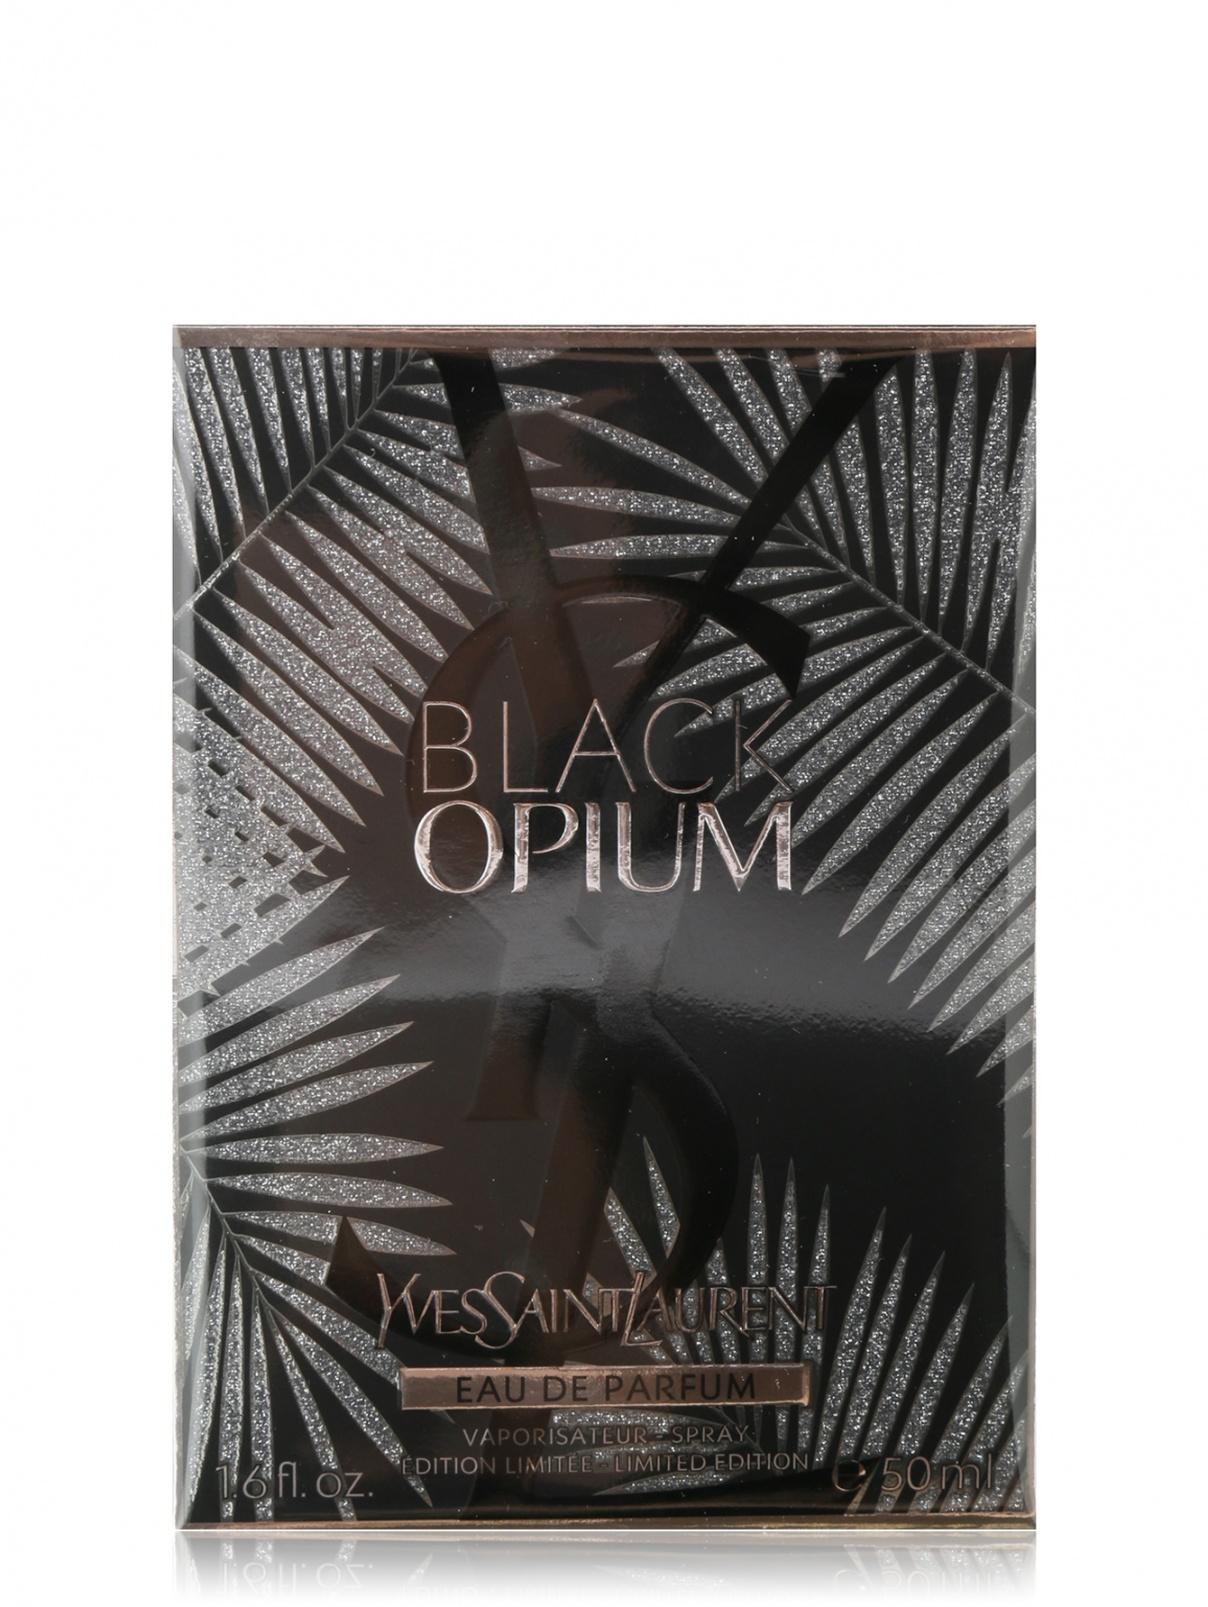 Парфюмерная вода 50 мл Exotic Illusion 19 OS Black Opium YSL  –  Общий вид